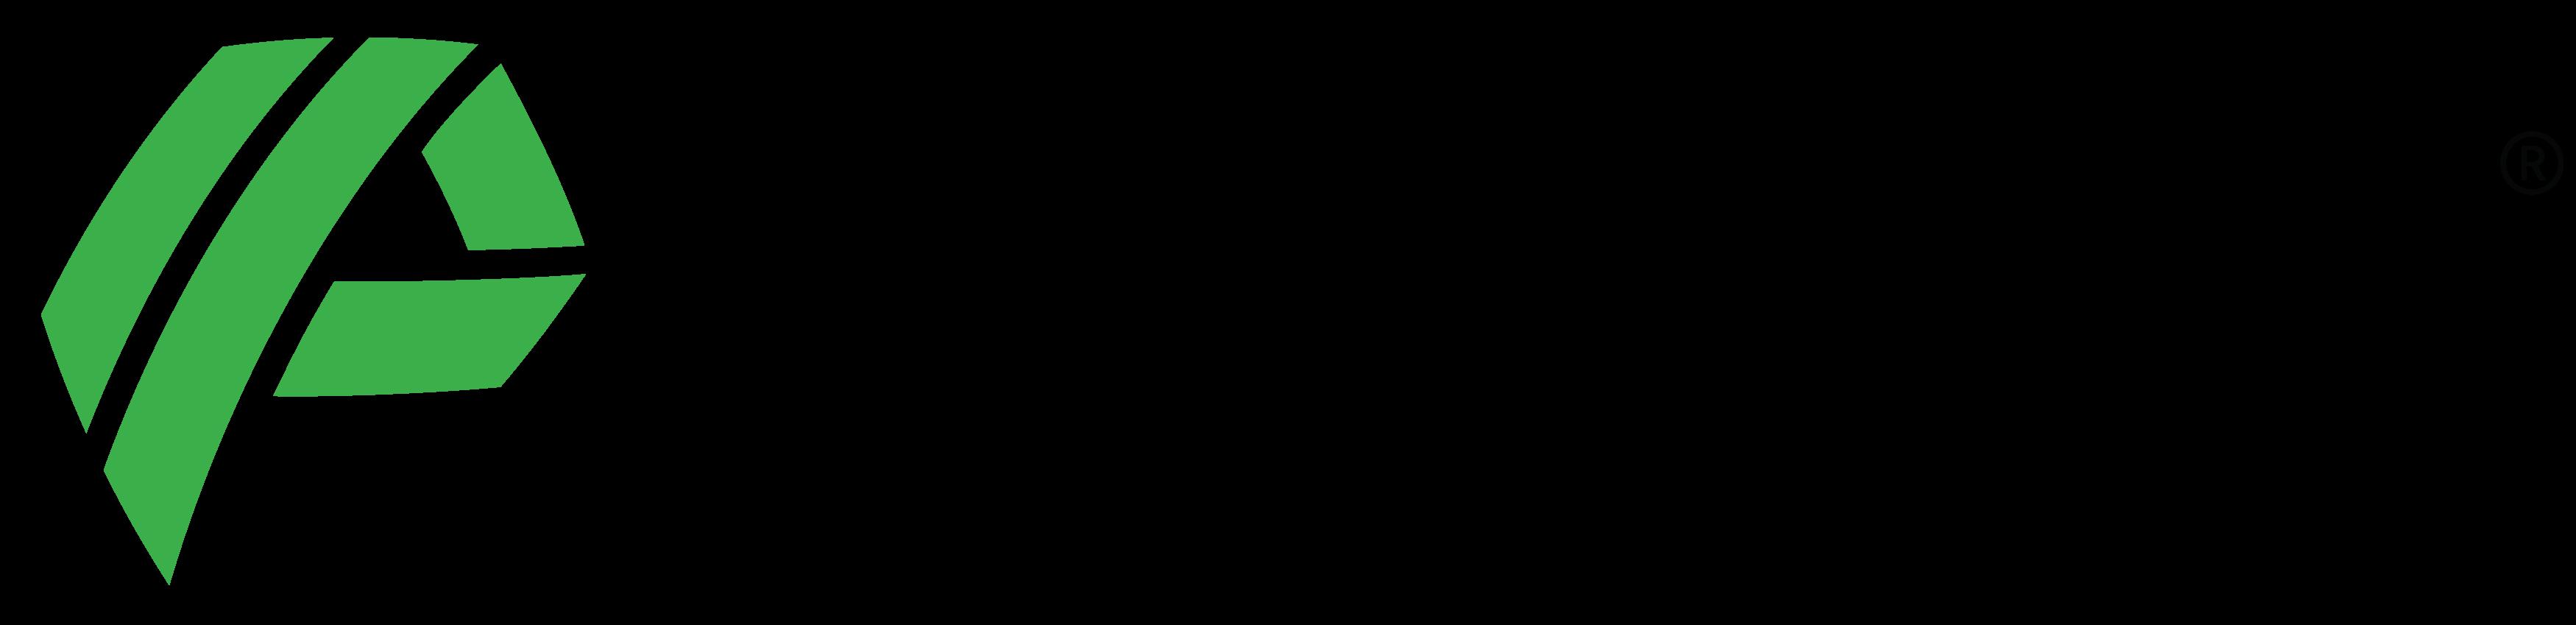 New Ply-Gem---Logo